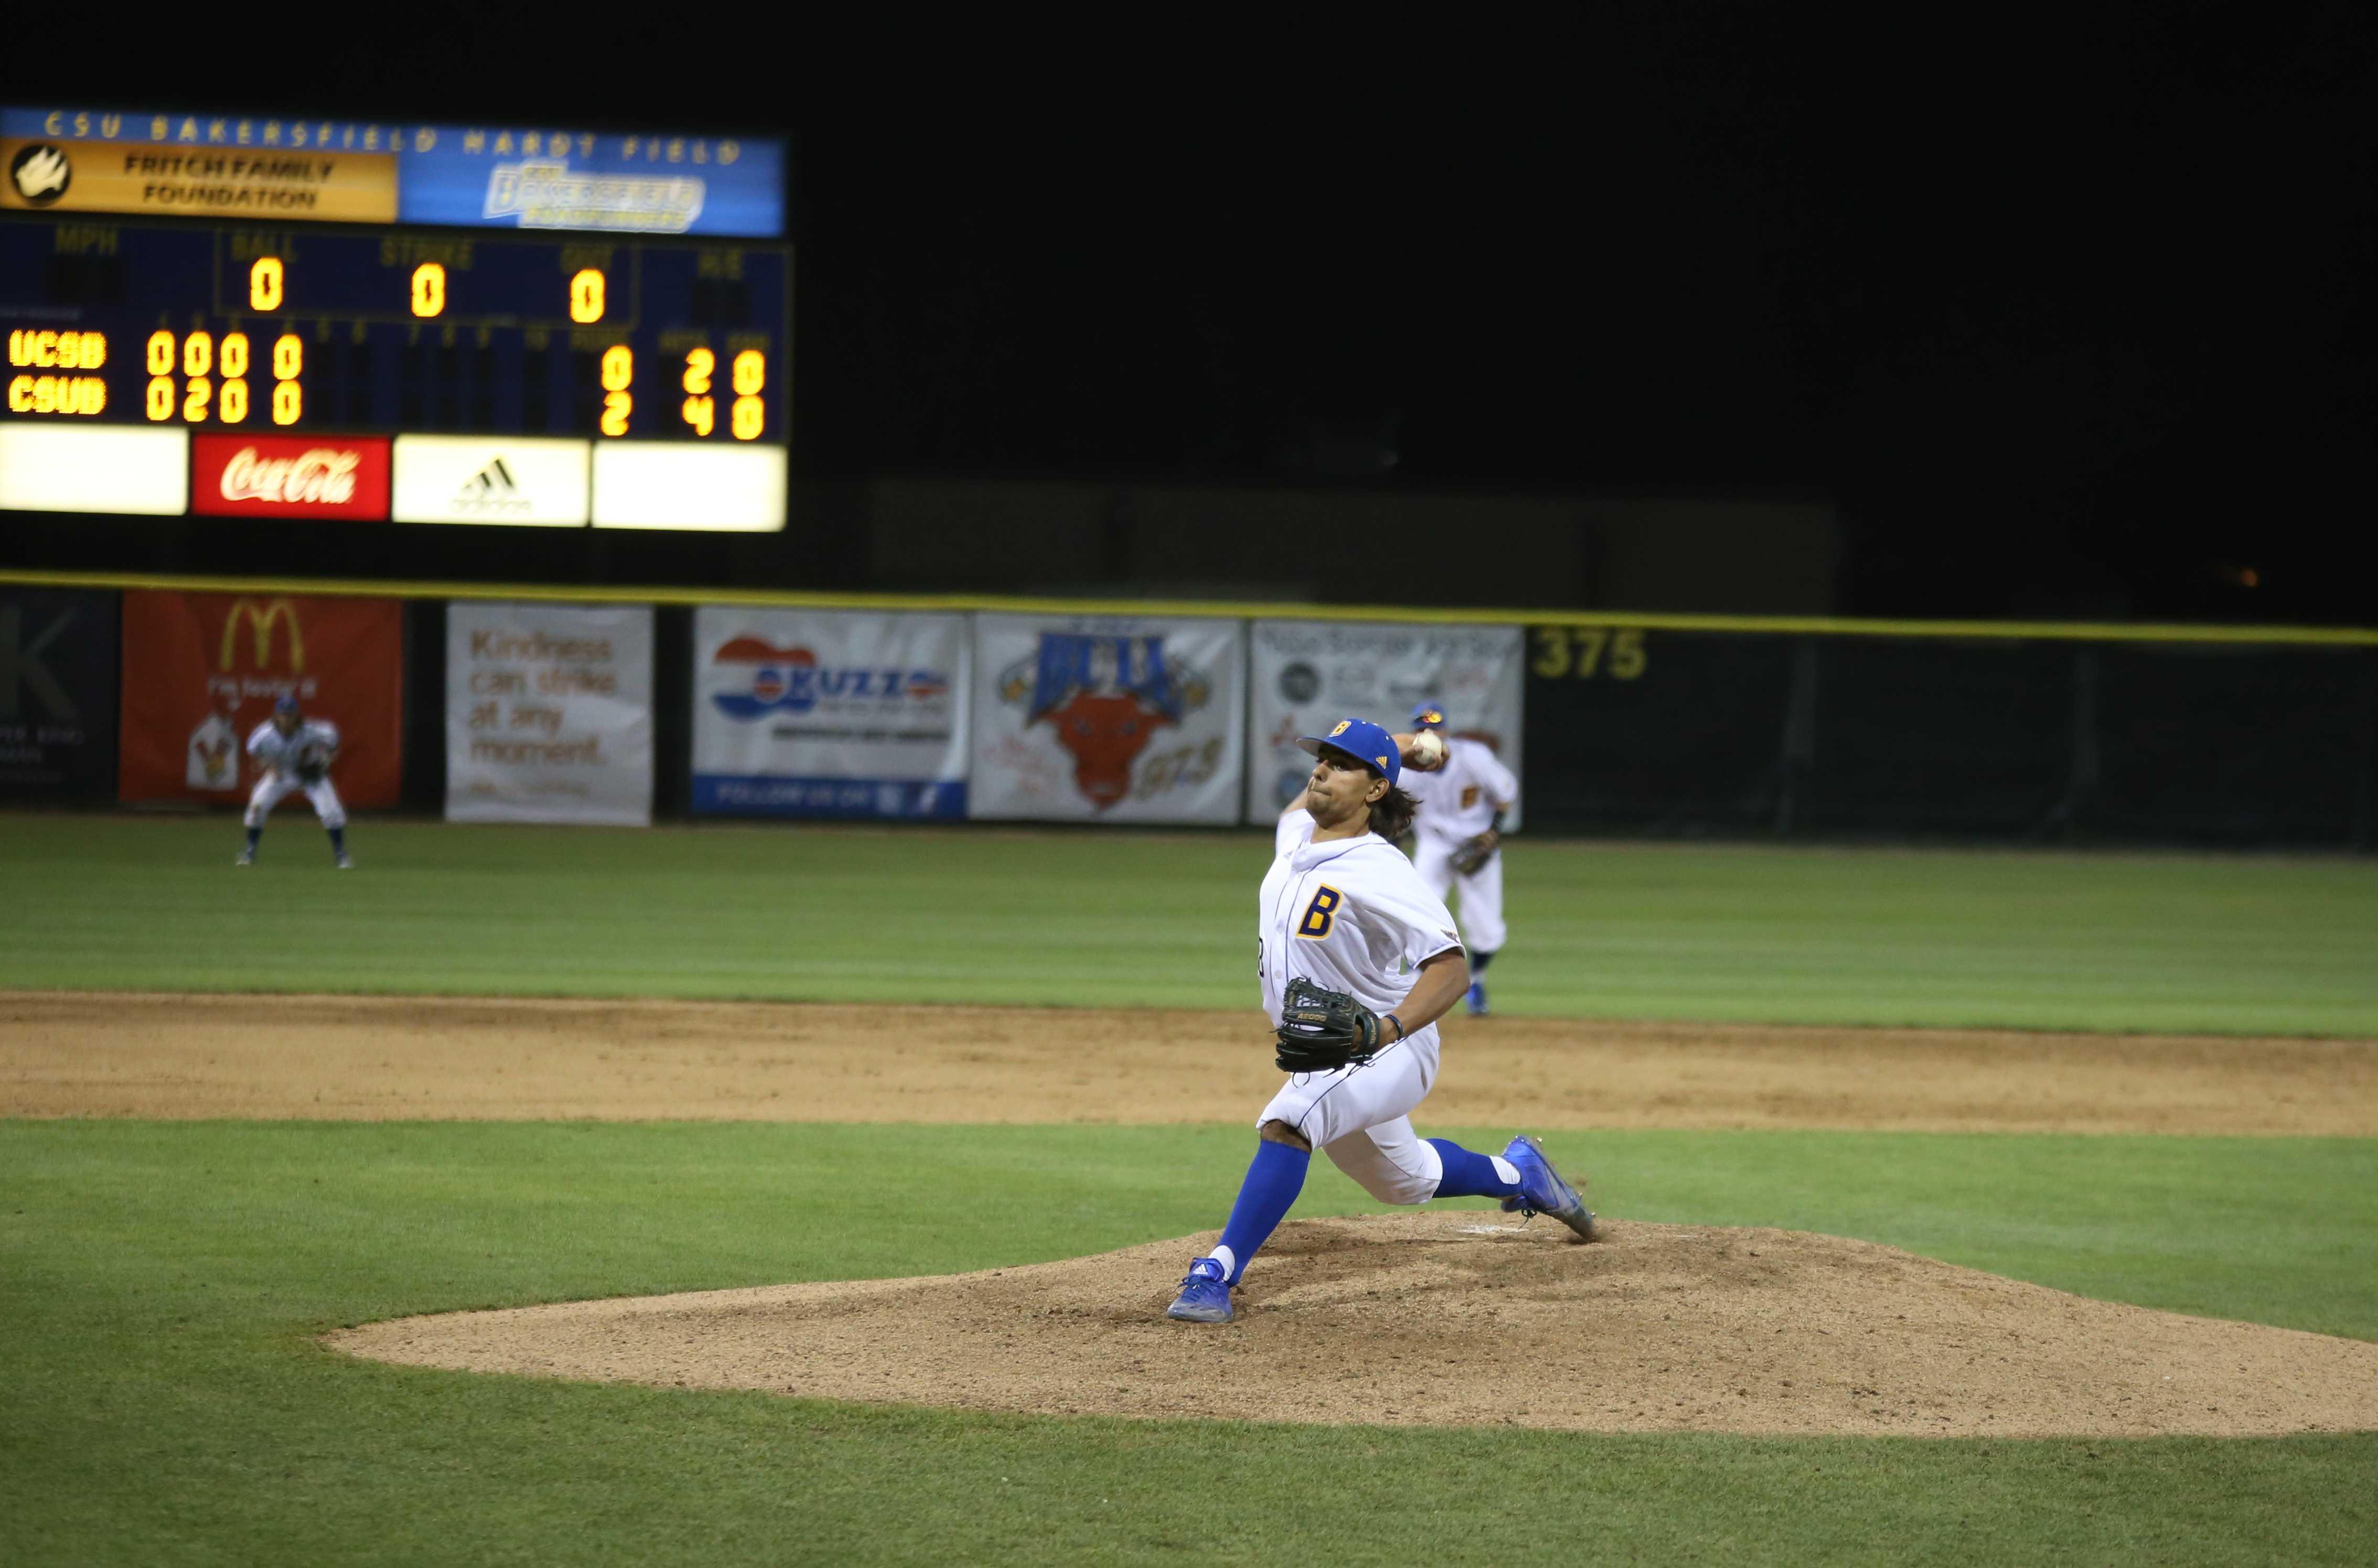 Roadrunners defeat UC Santa Barbara in pitcher's duel